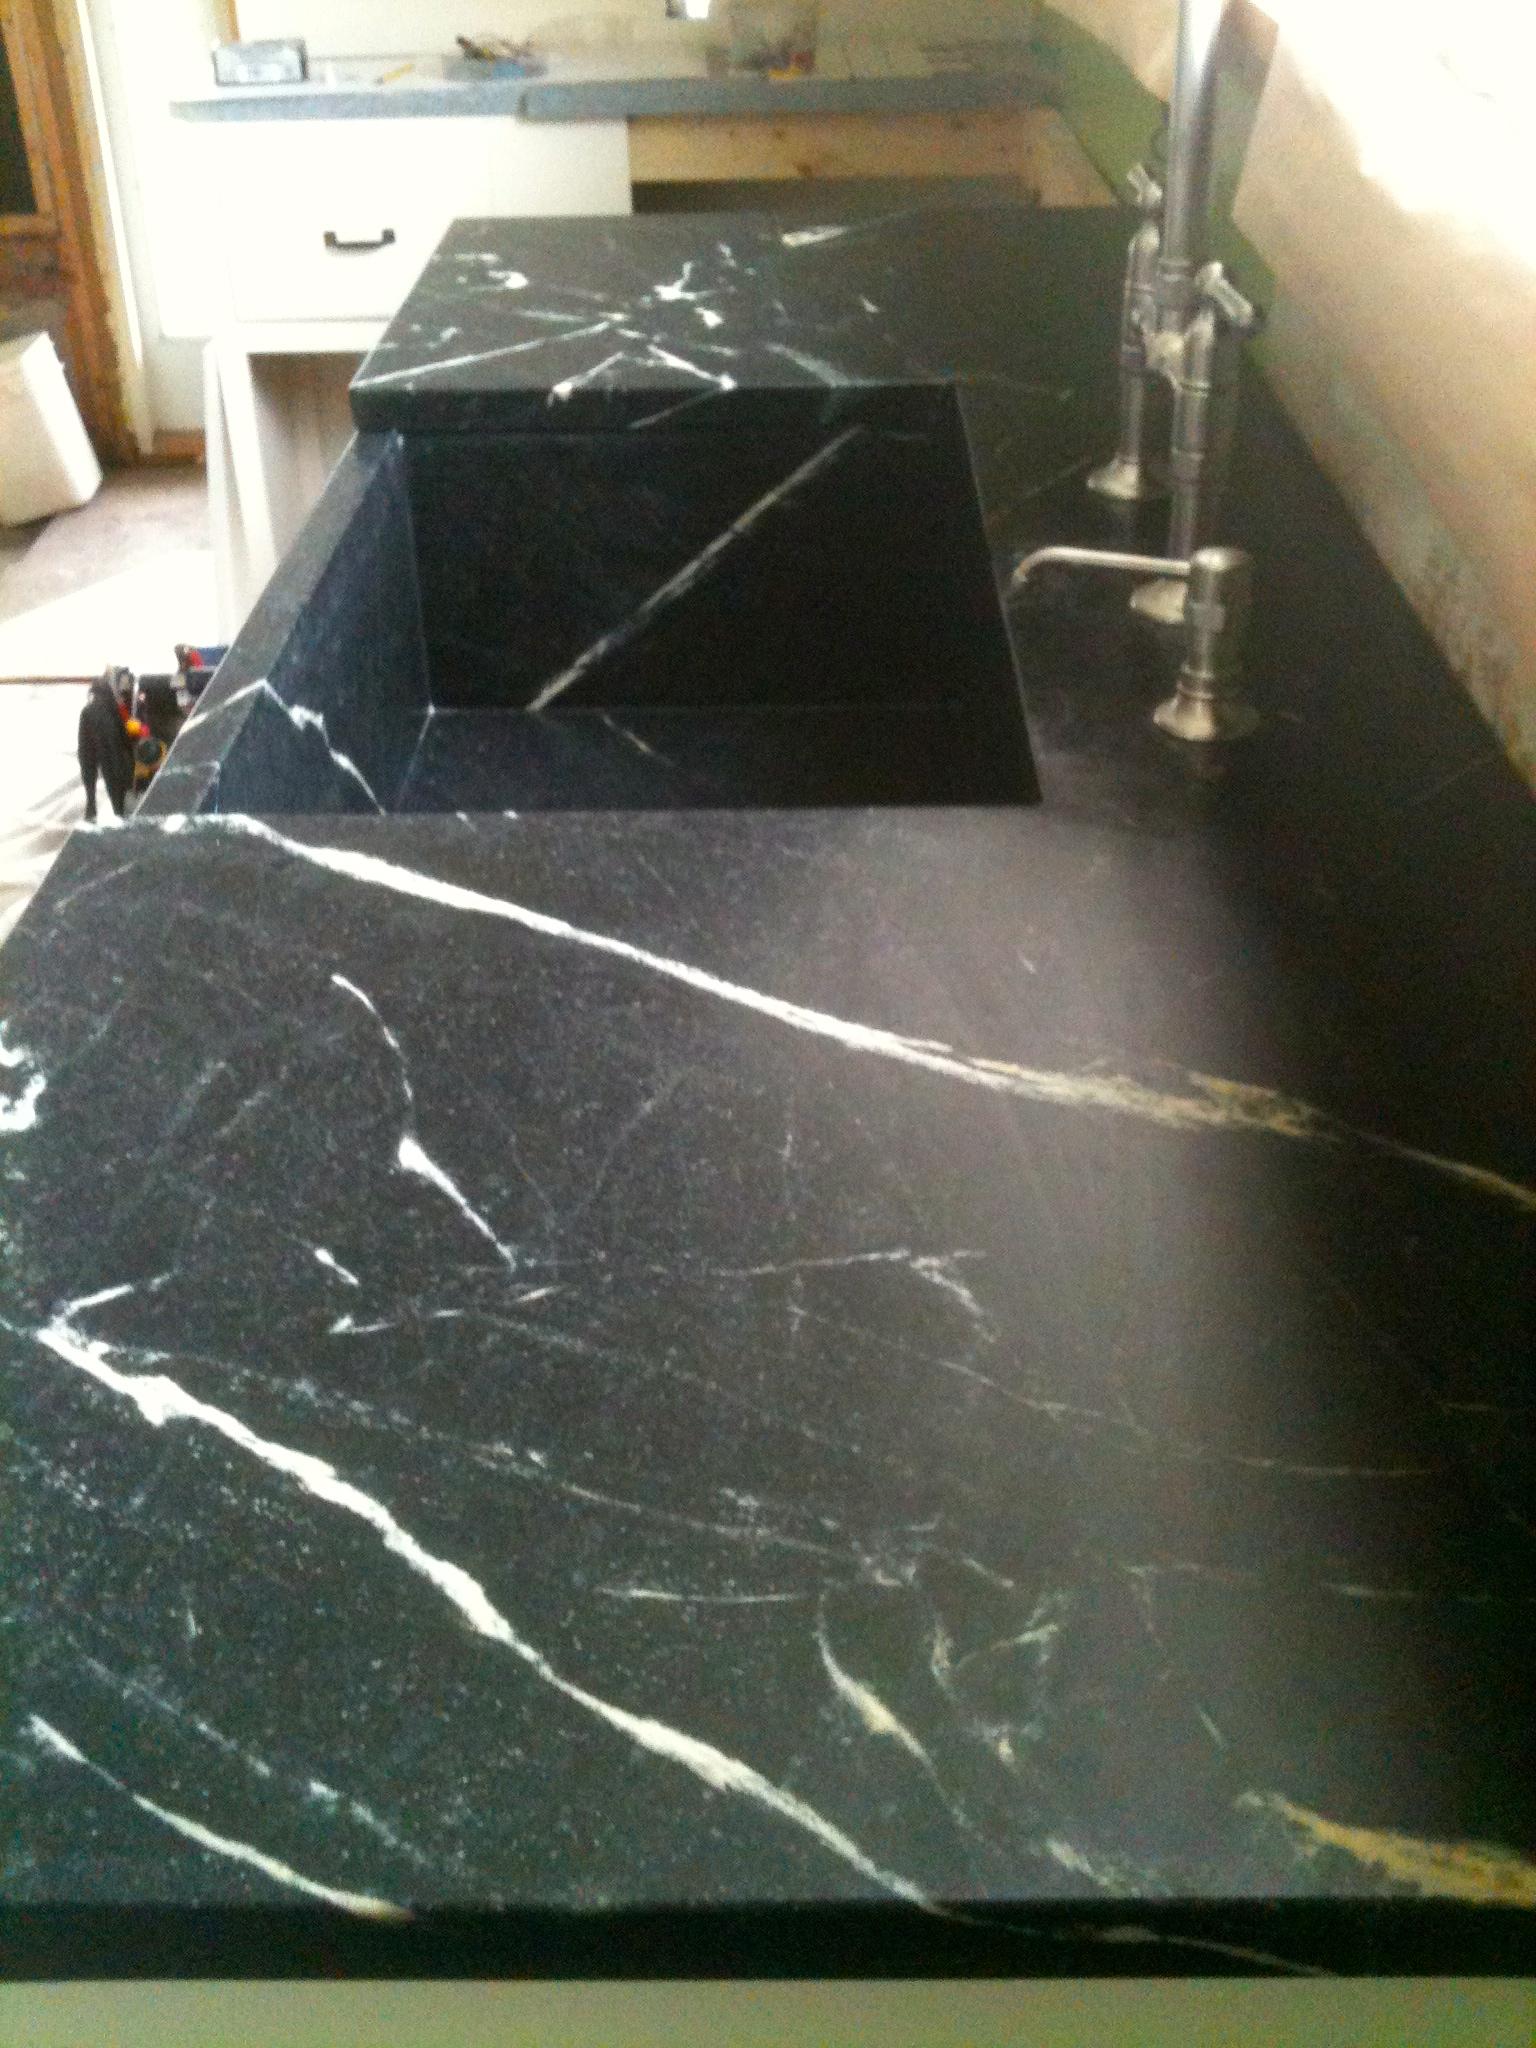 soapstone countertop soapstone kitchen countertops trendy oiled soapstone countertop and sink from bucks county soapstone with soapstone countertop